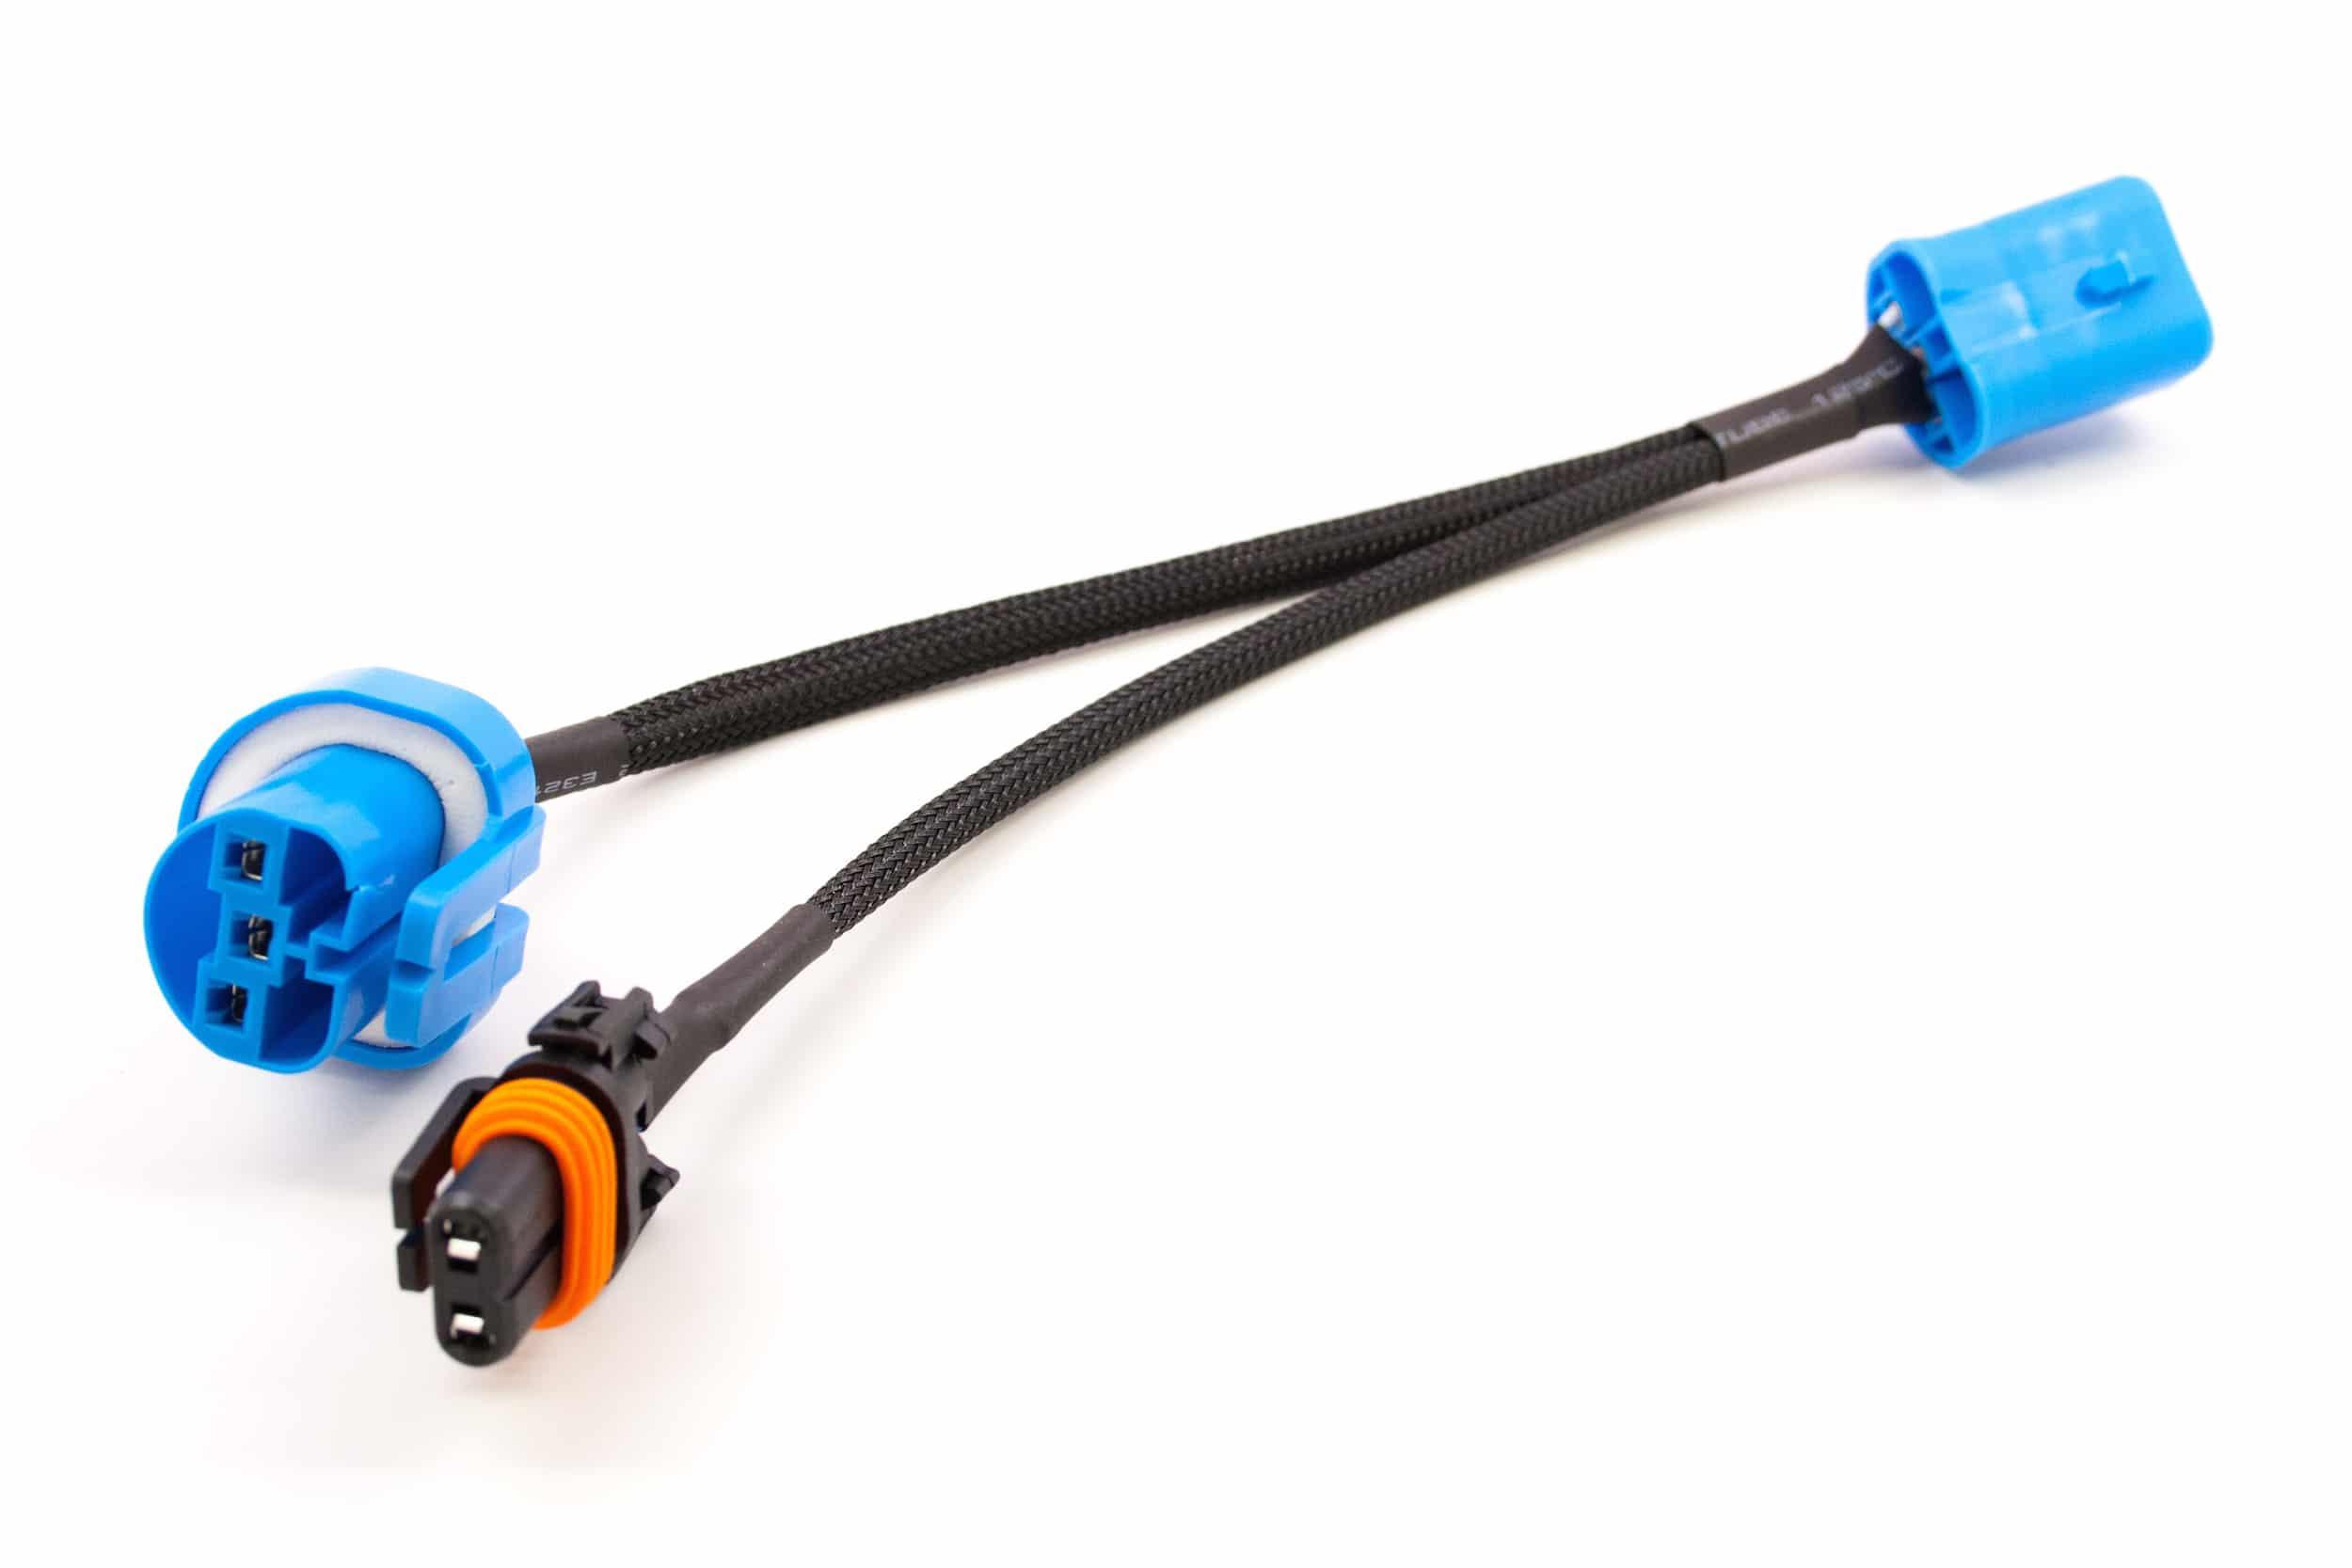 Headlight High Beam Wiring Splitters 9007 9006 – GTA RETROFITS on